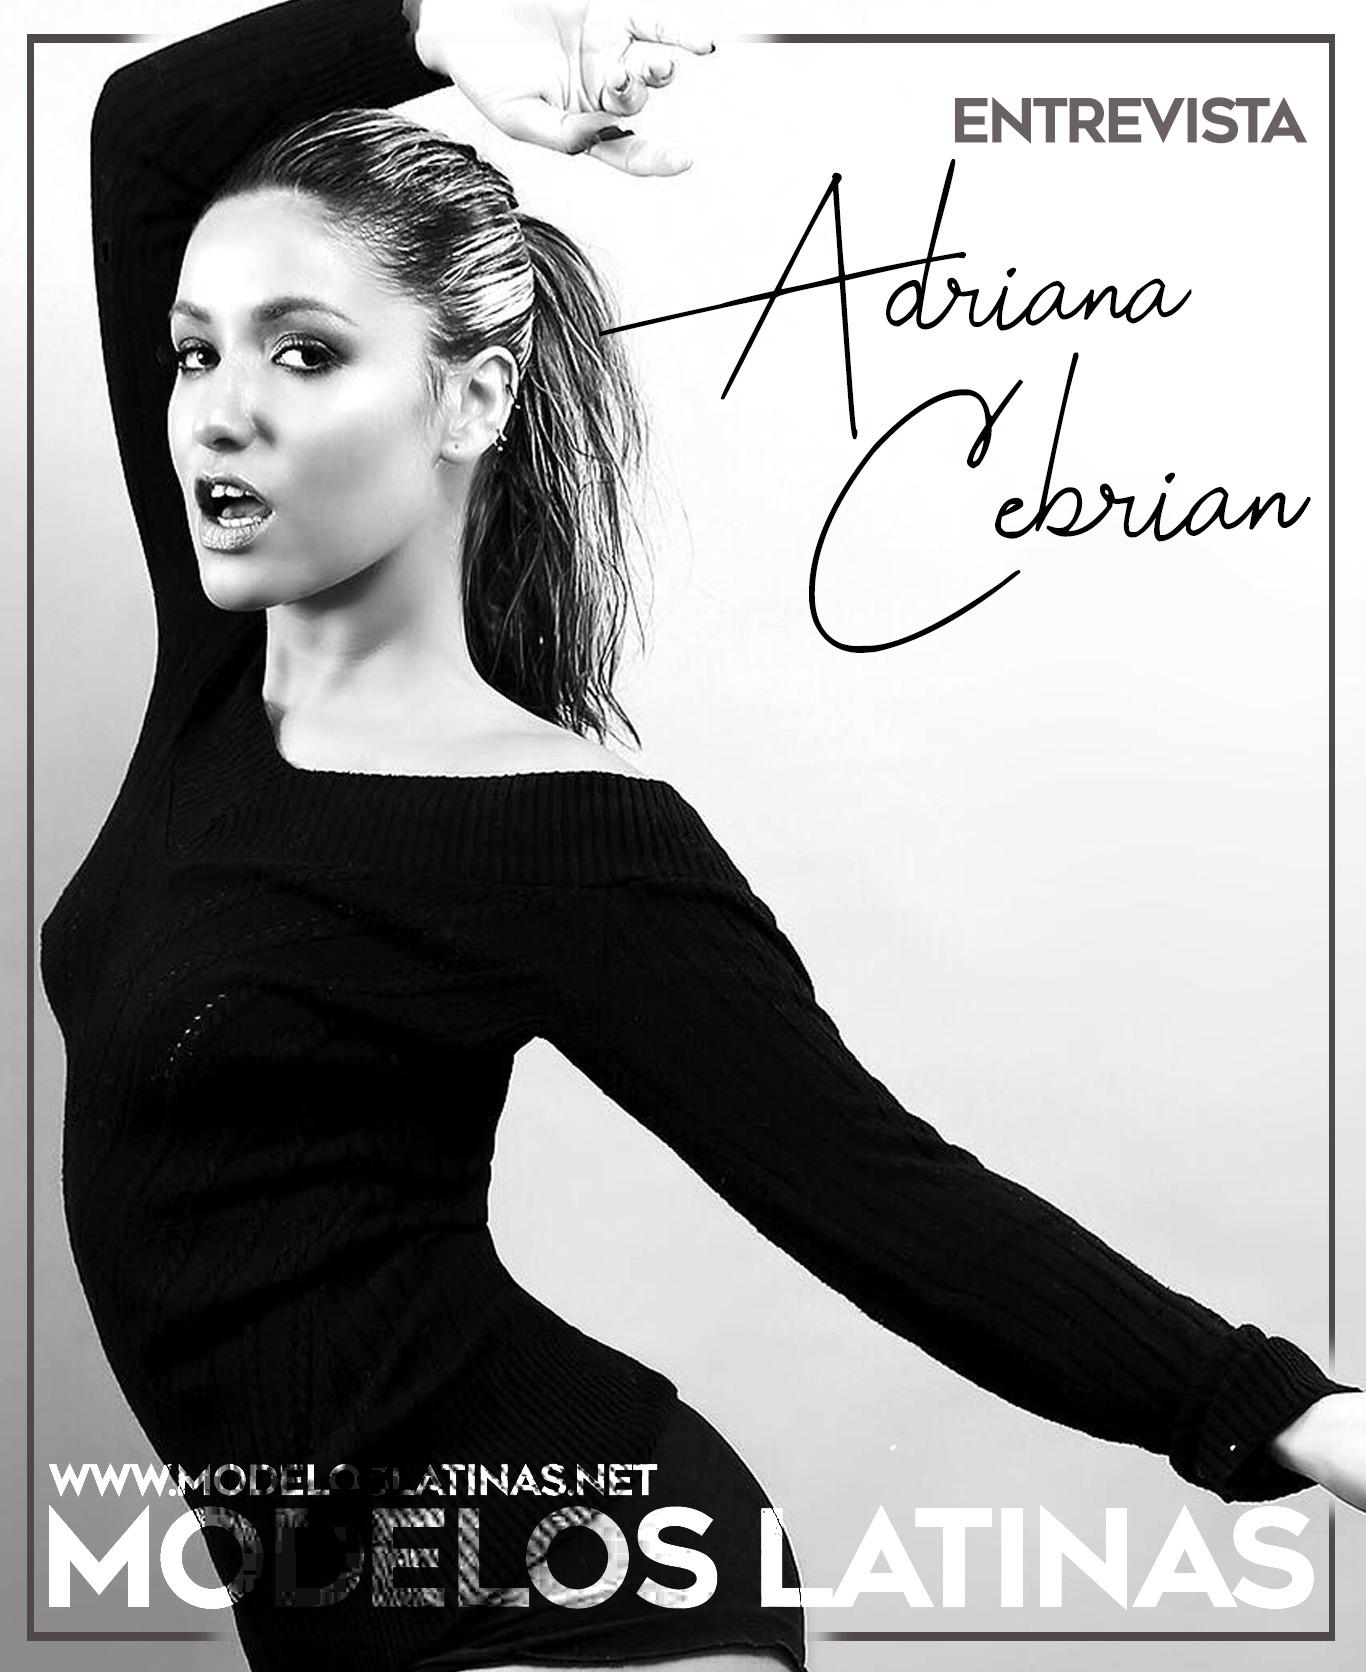 Adriana Cebrián